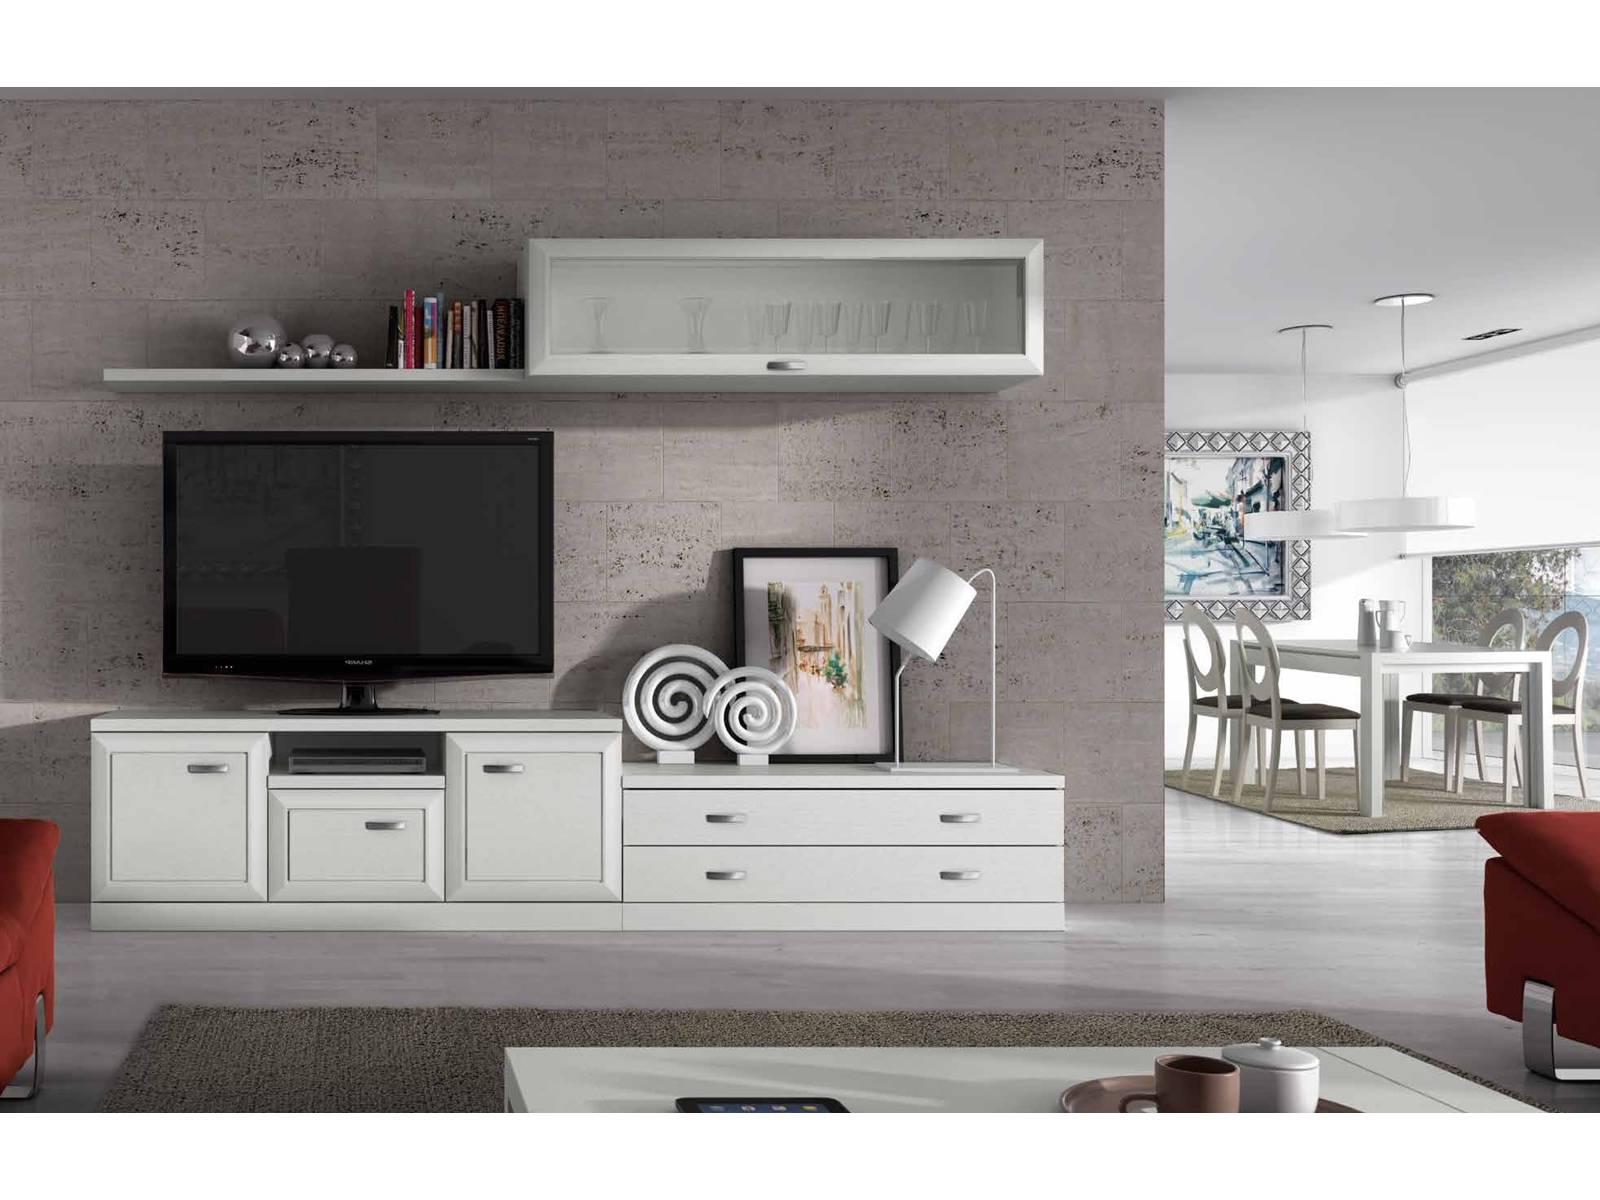 Muebles Salon Modulares S1du Mueble De Salà N Modular Blanco